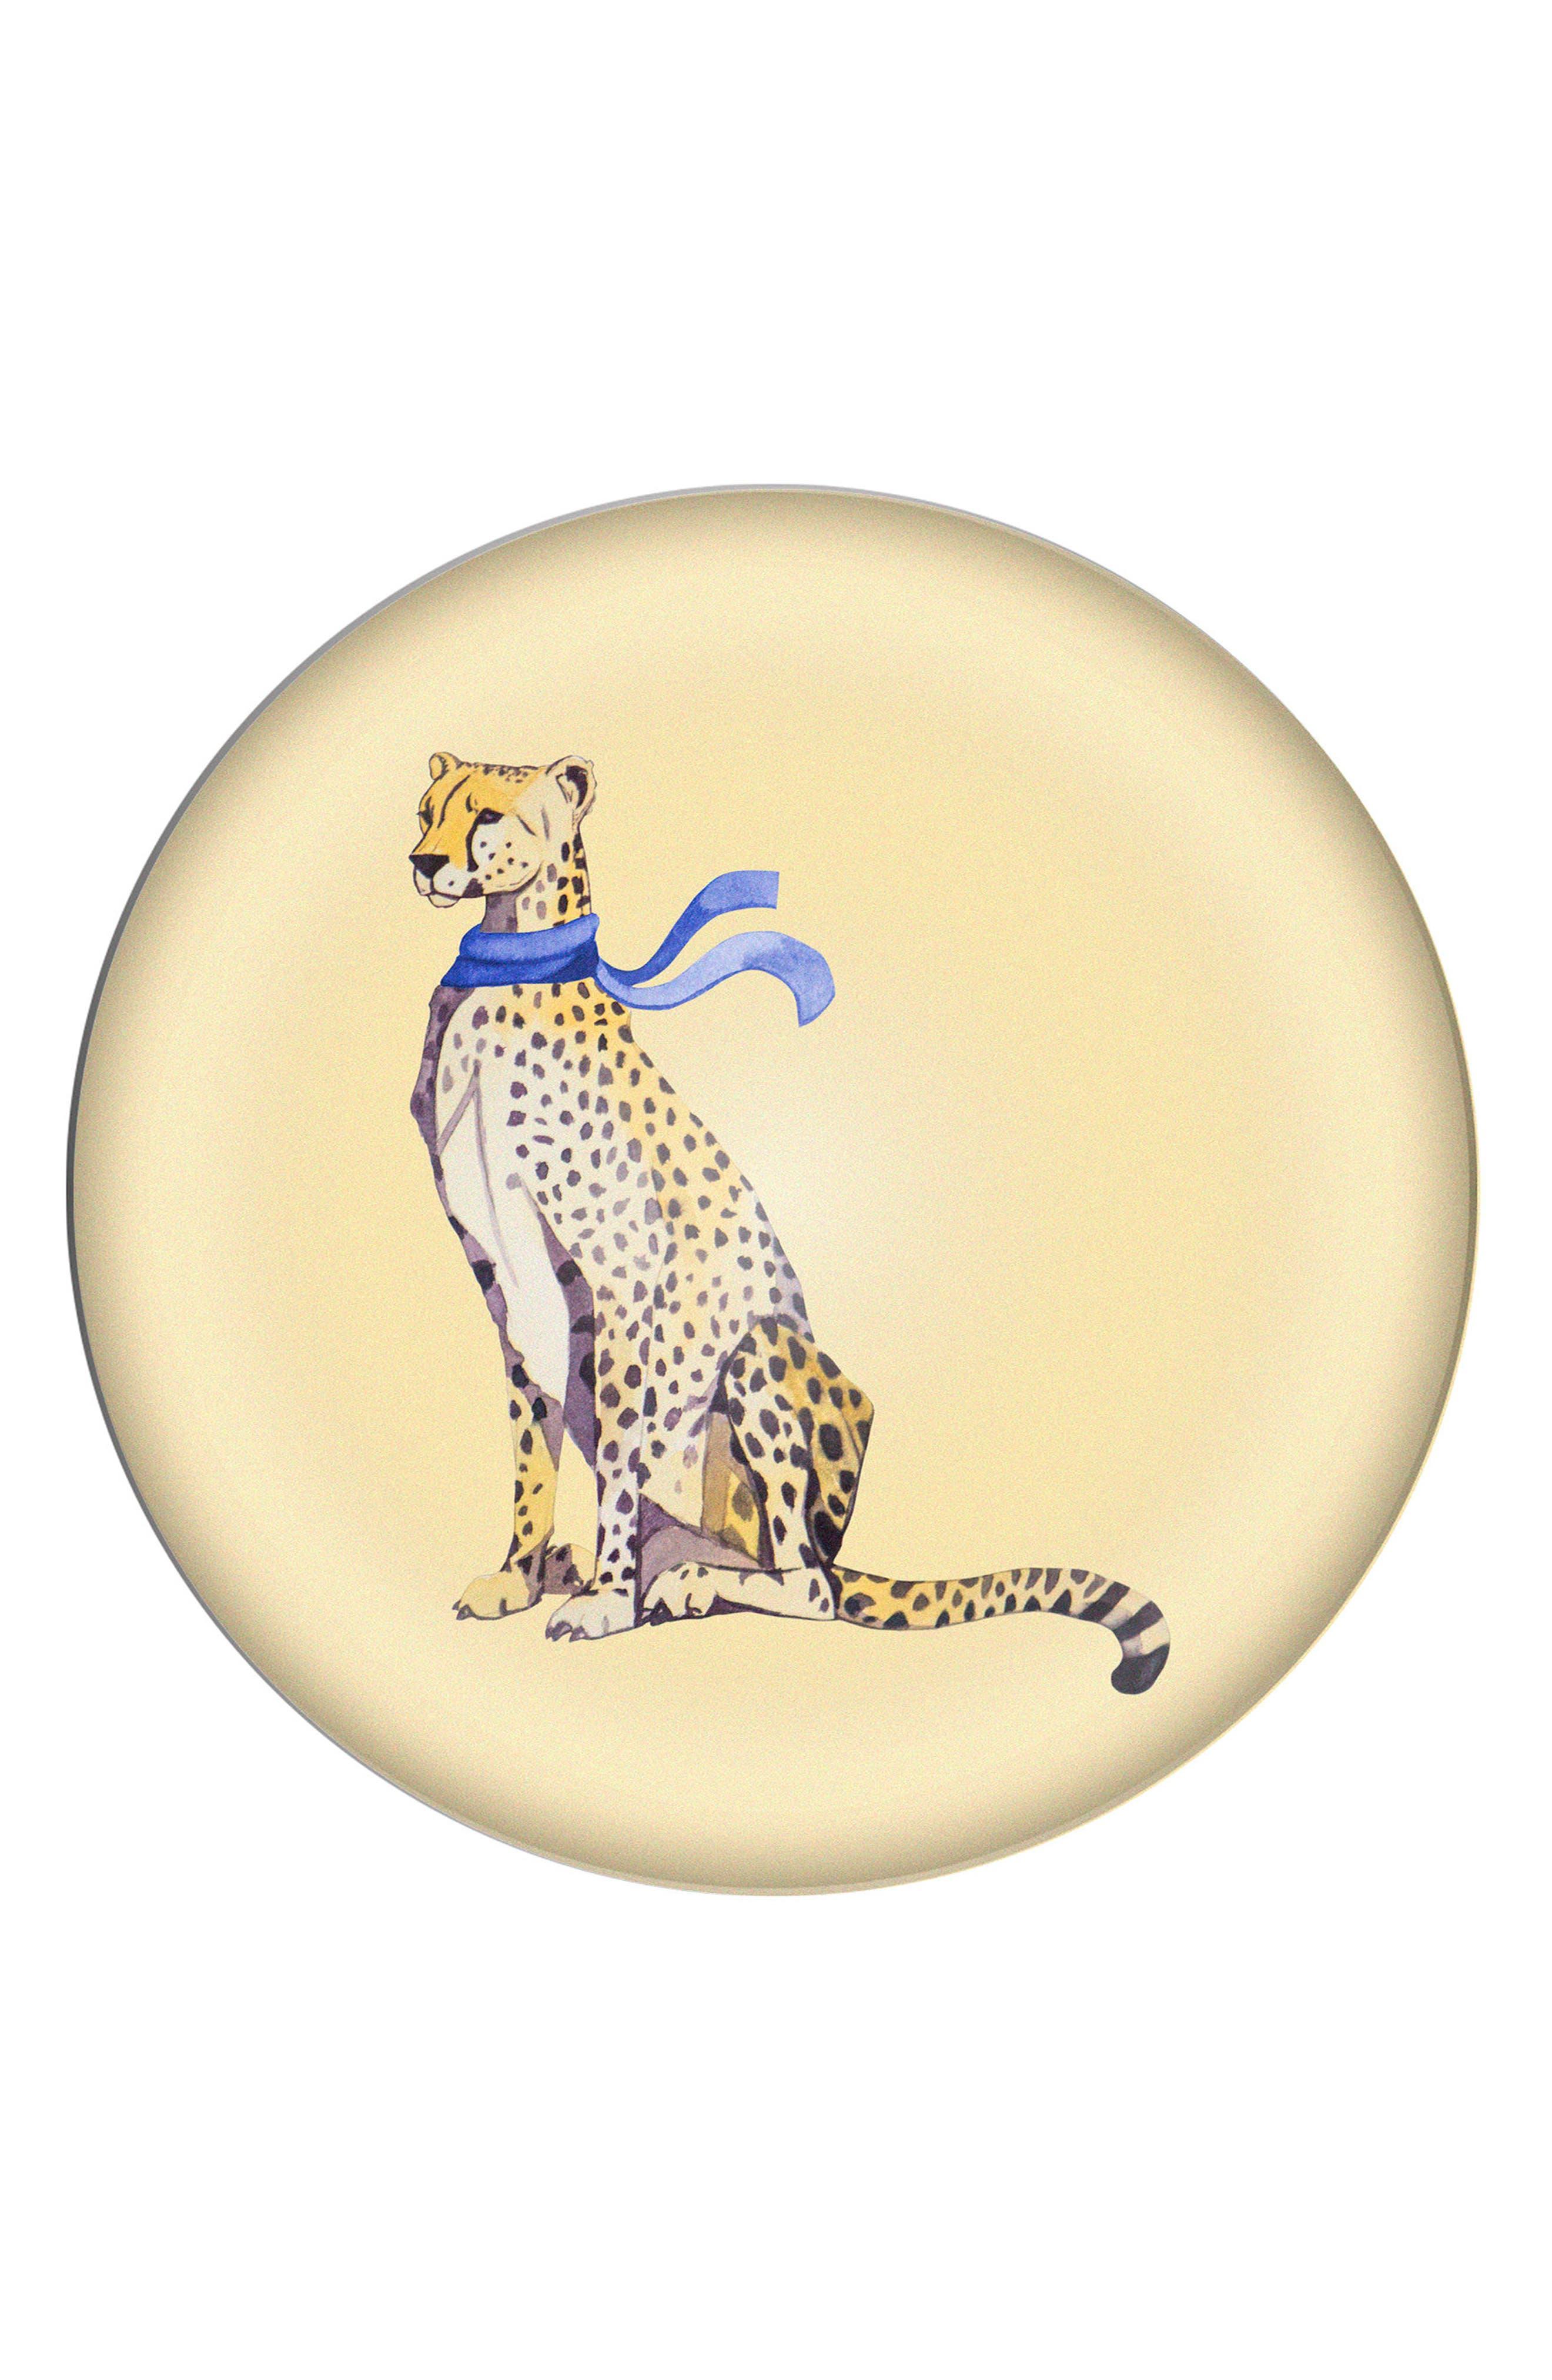 Cheetah Domed Glass Paperweight,                             Main thumbnail 1, color,                             700